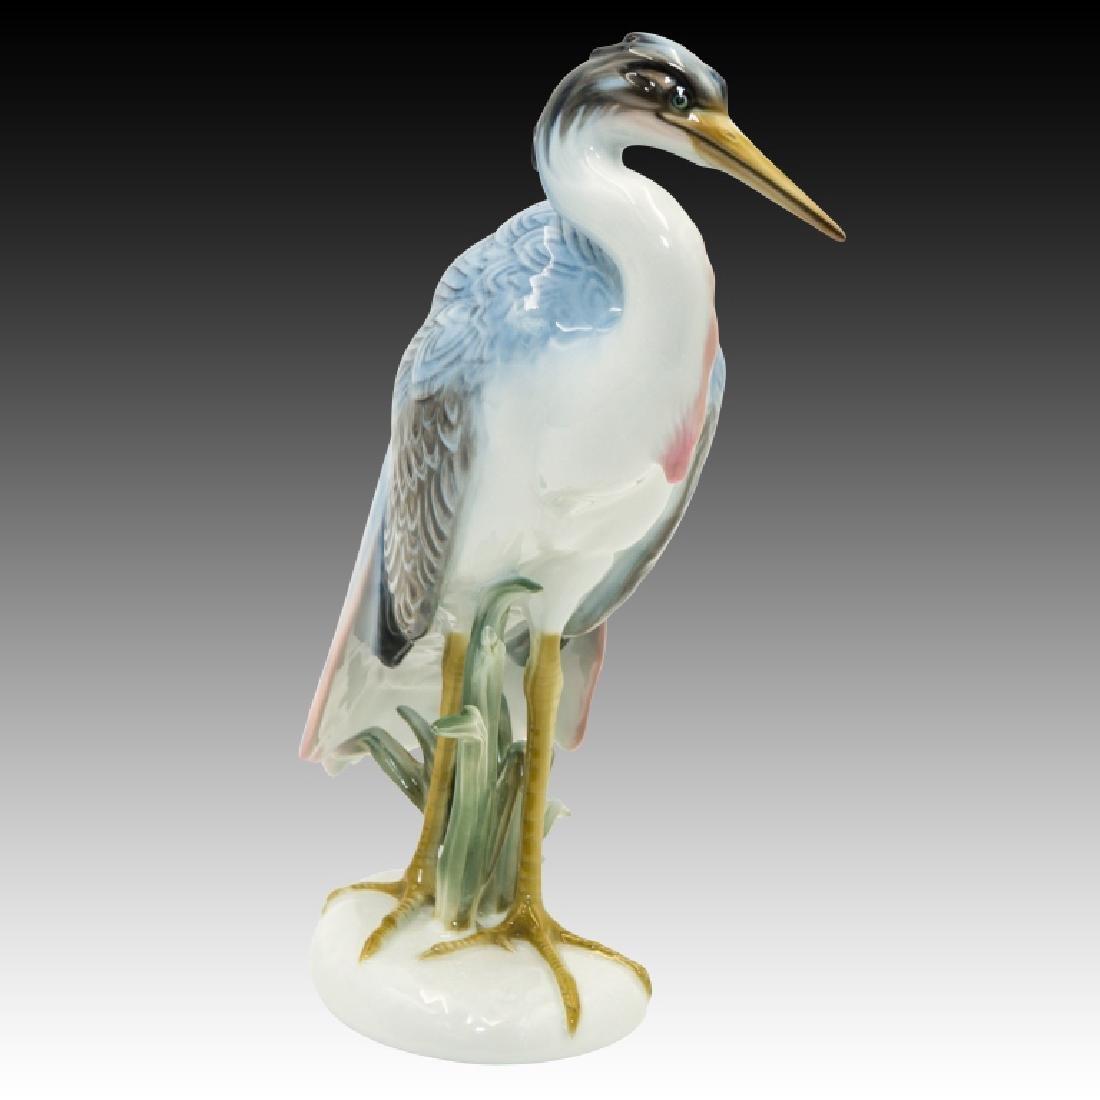 Rosenthal Large Heron Figurine - 4